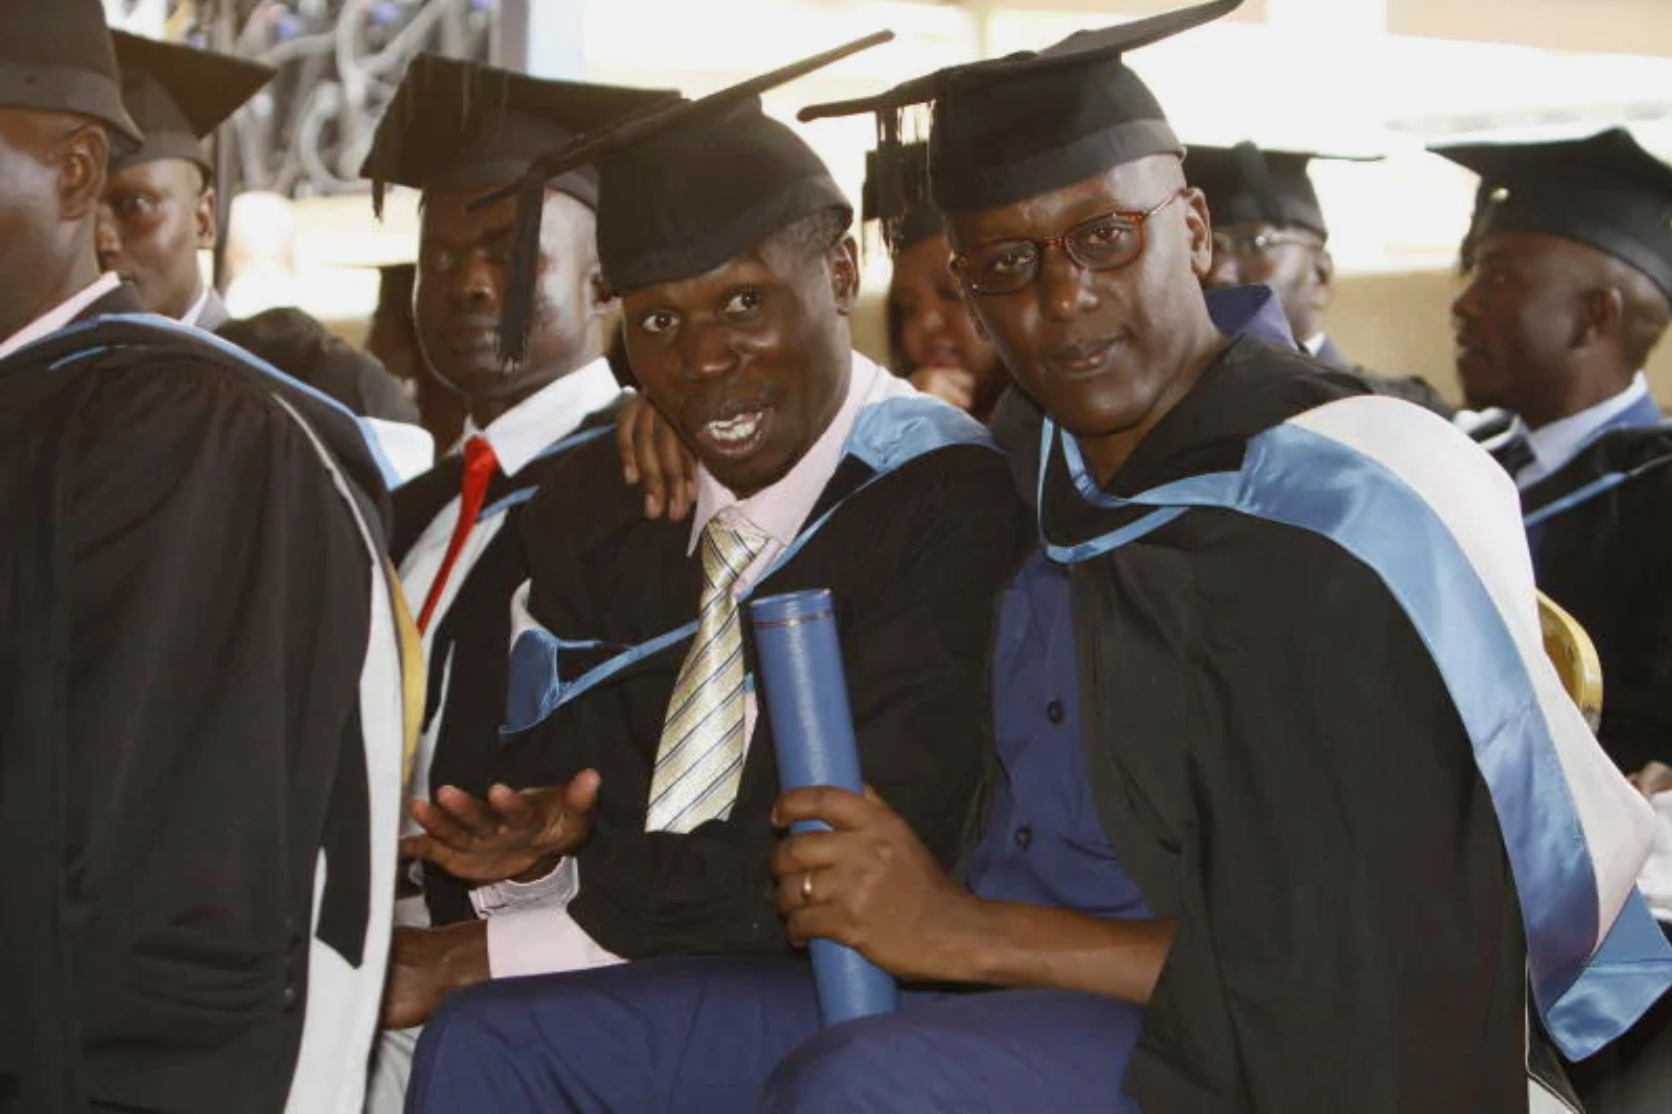 Tuko – Kamiti Prison: 10 inmates graduate with law degrees